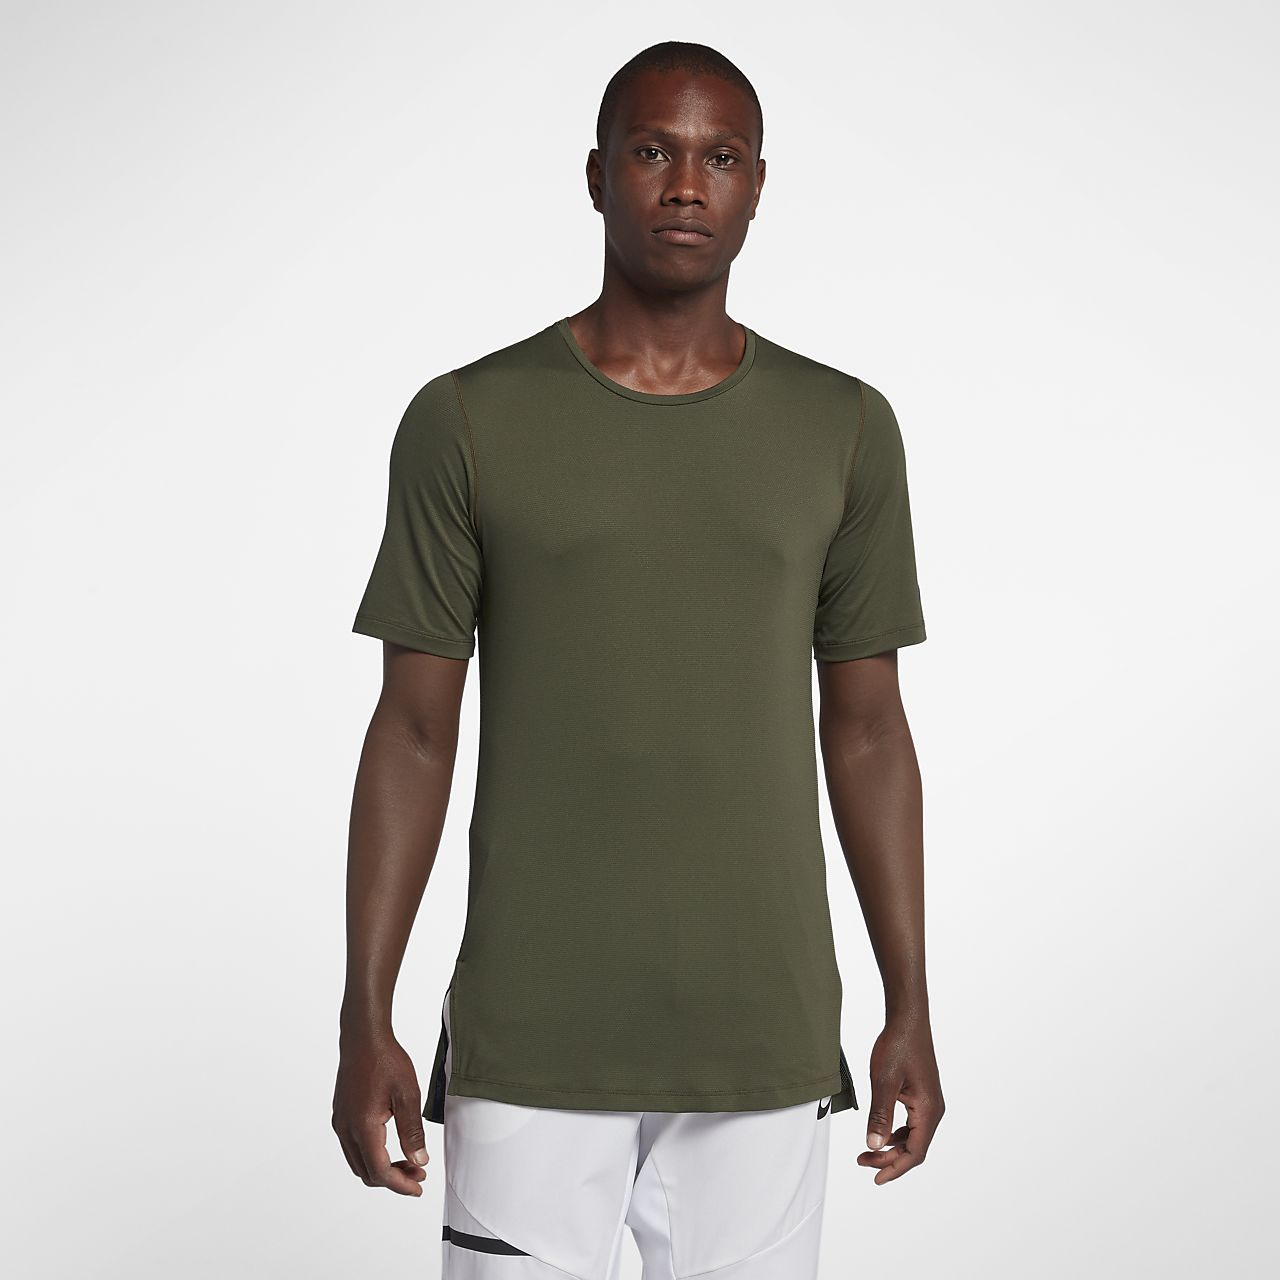 b9109e509c32 Nike Dri-FIT Men s Utility Short-Sleeve Training Top. Nike.com GB